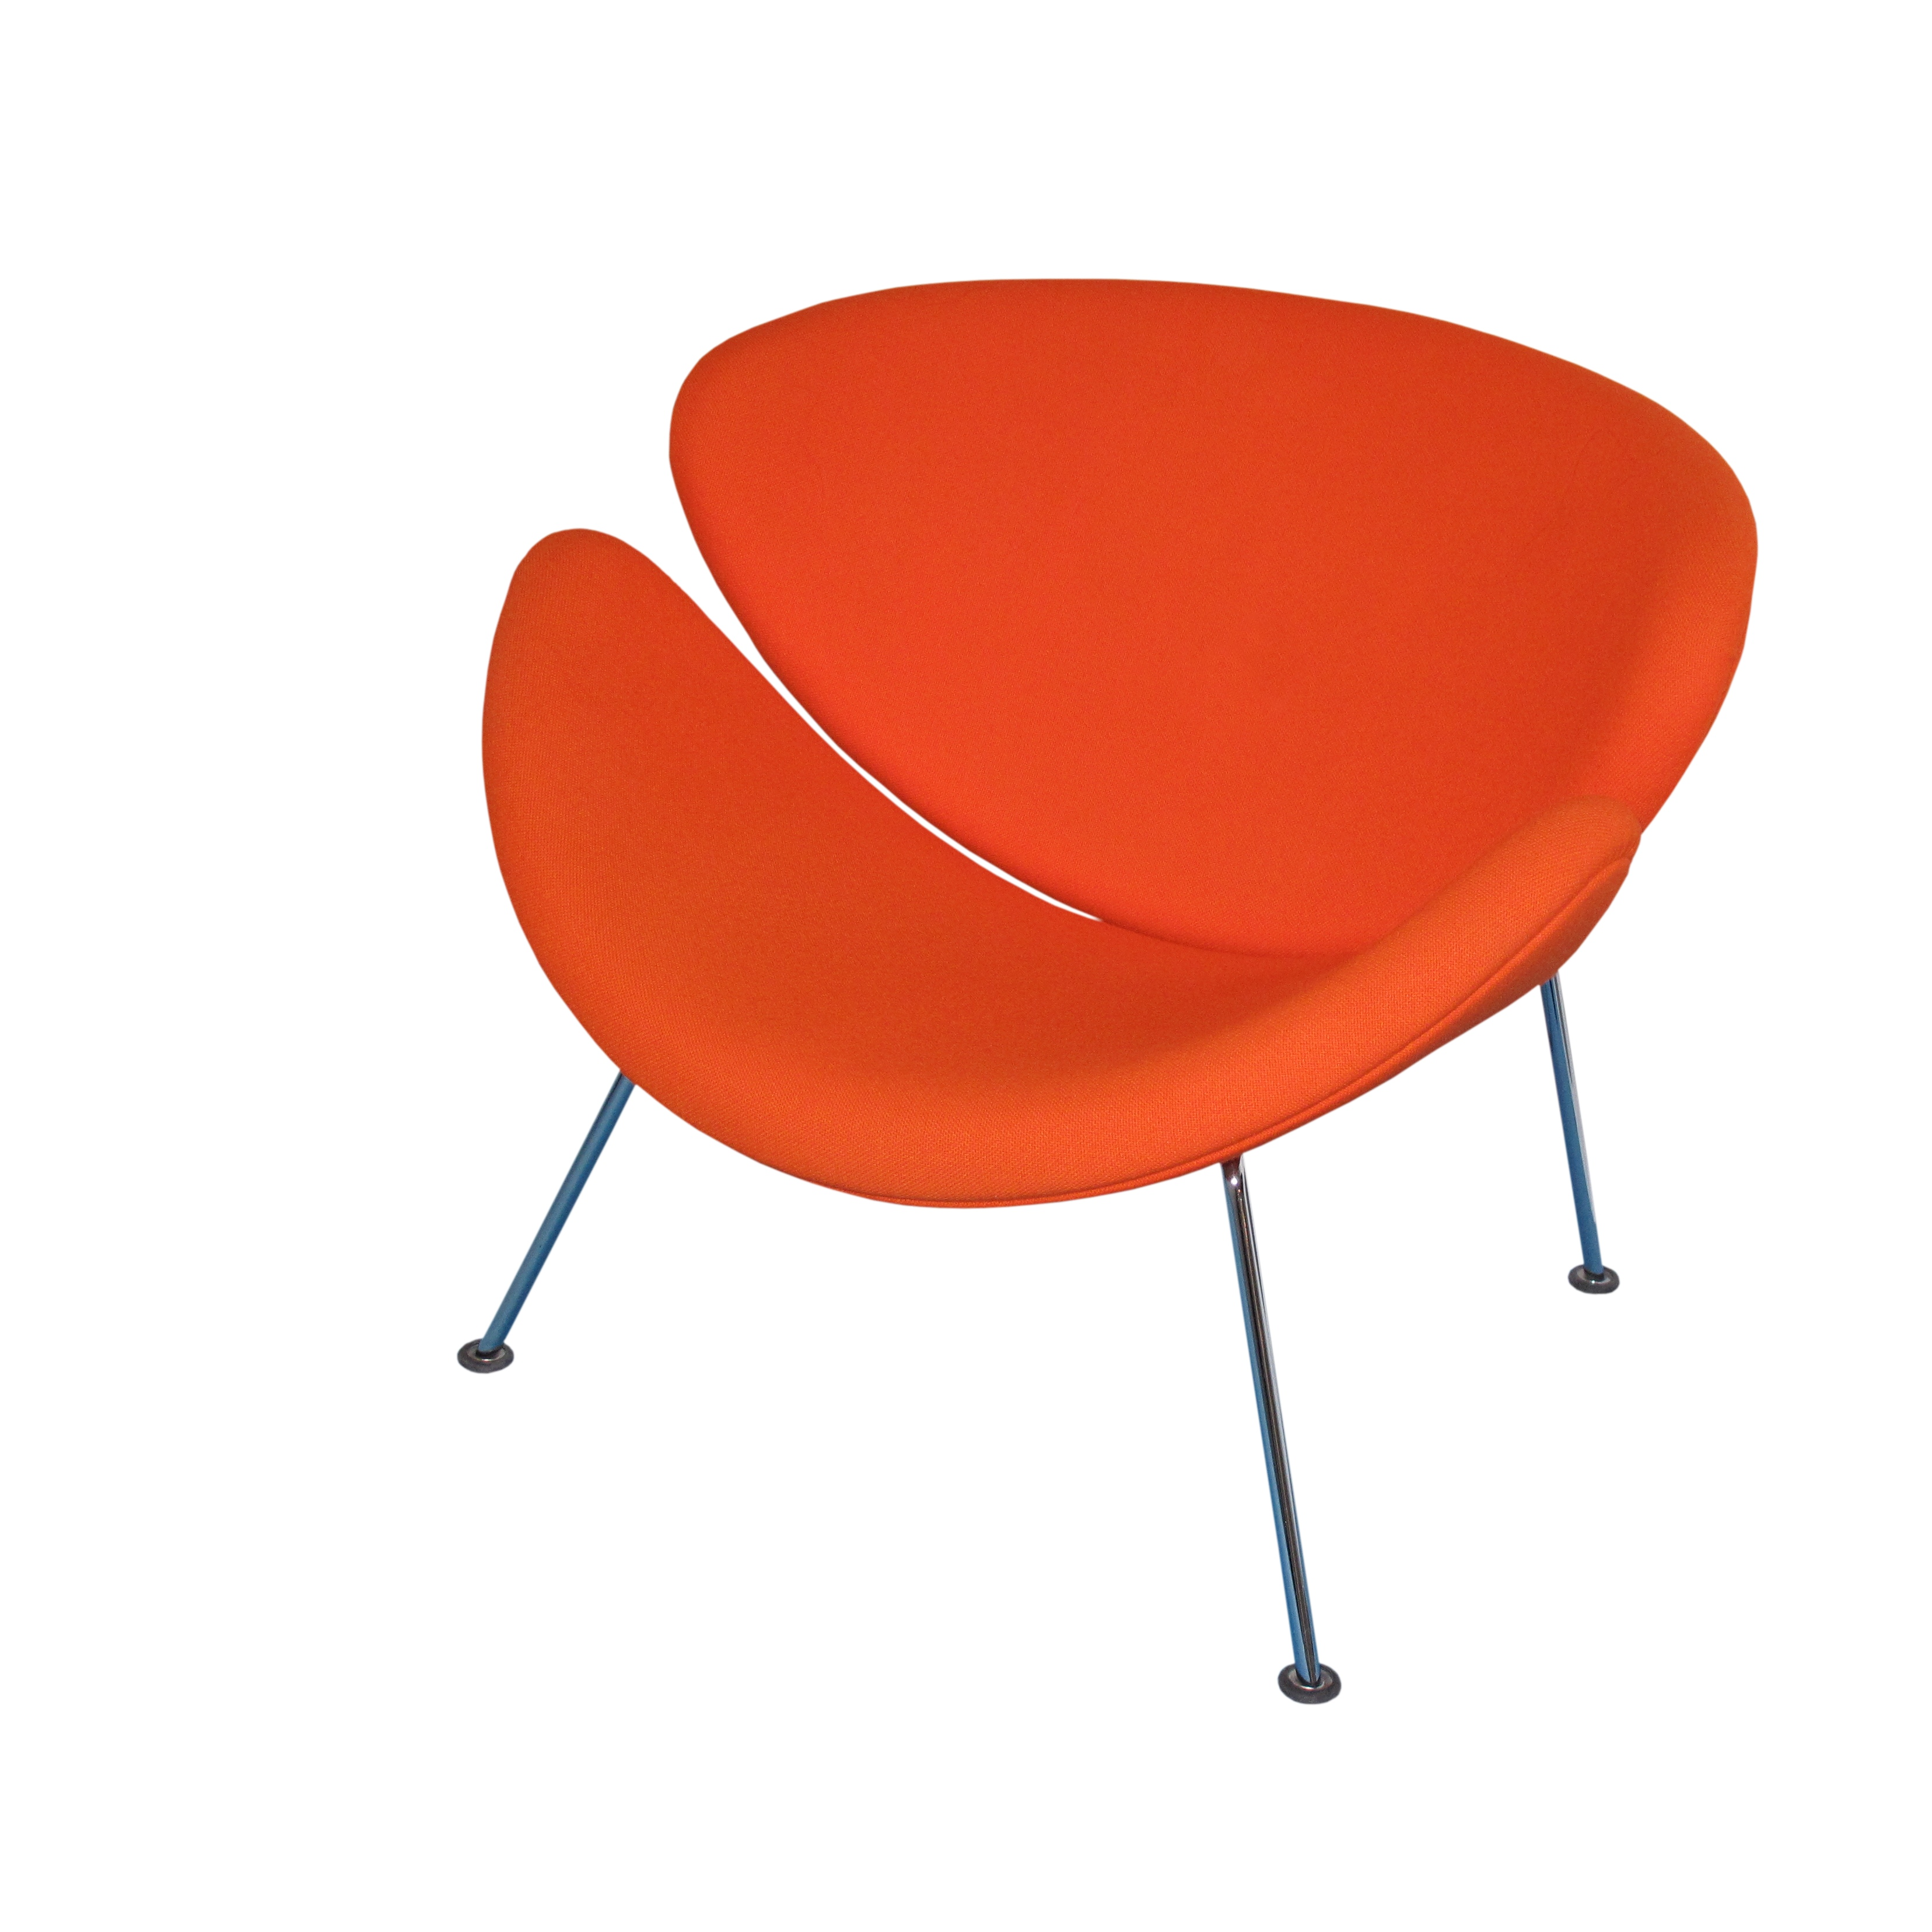 FileOrange Slice ChairPierre Paulin IMG 5835whitejpg – Pierre Chair